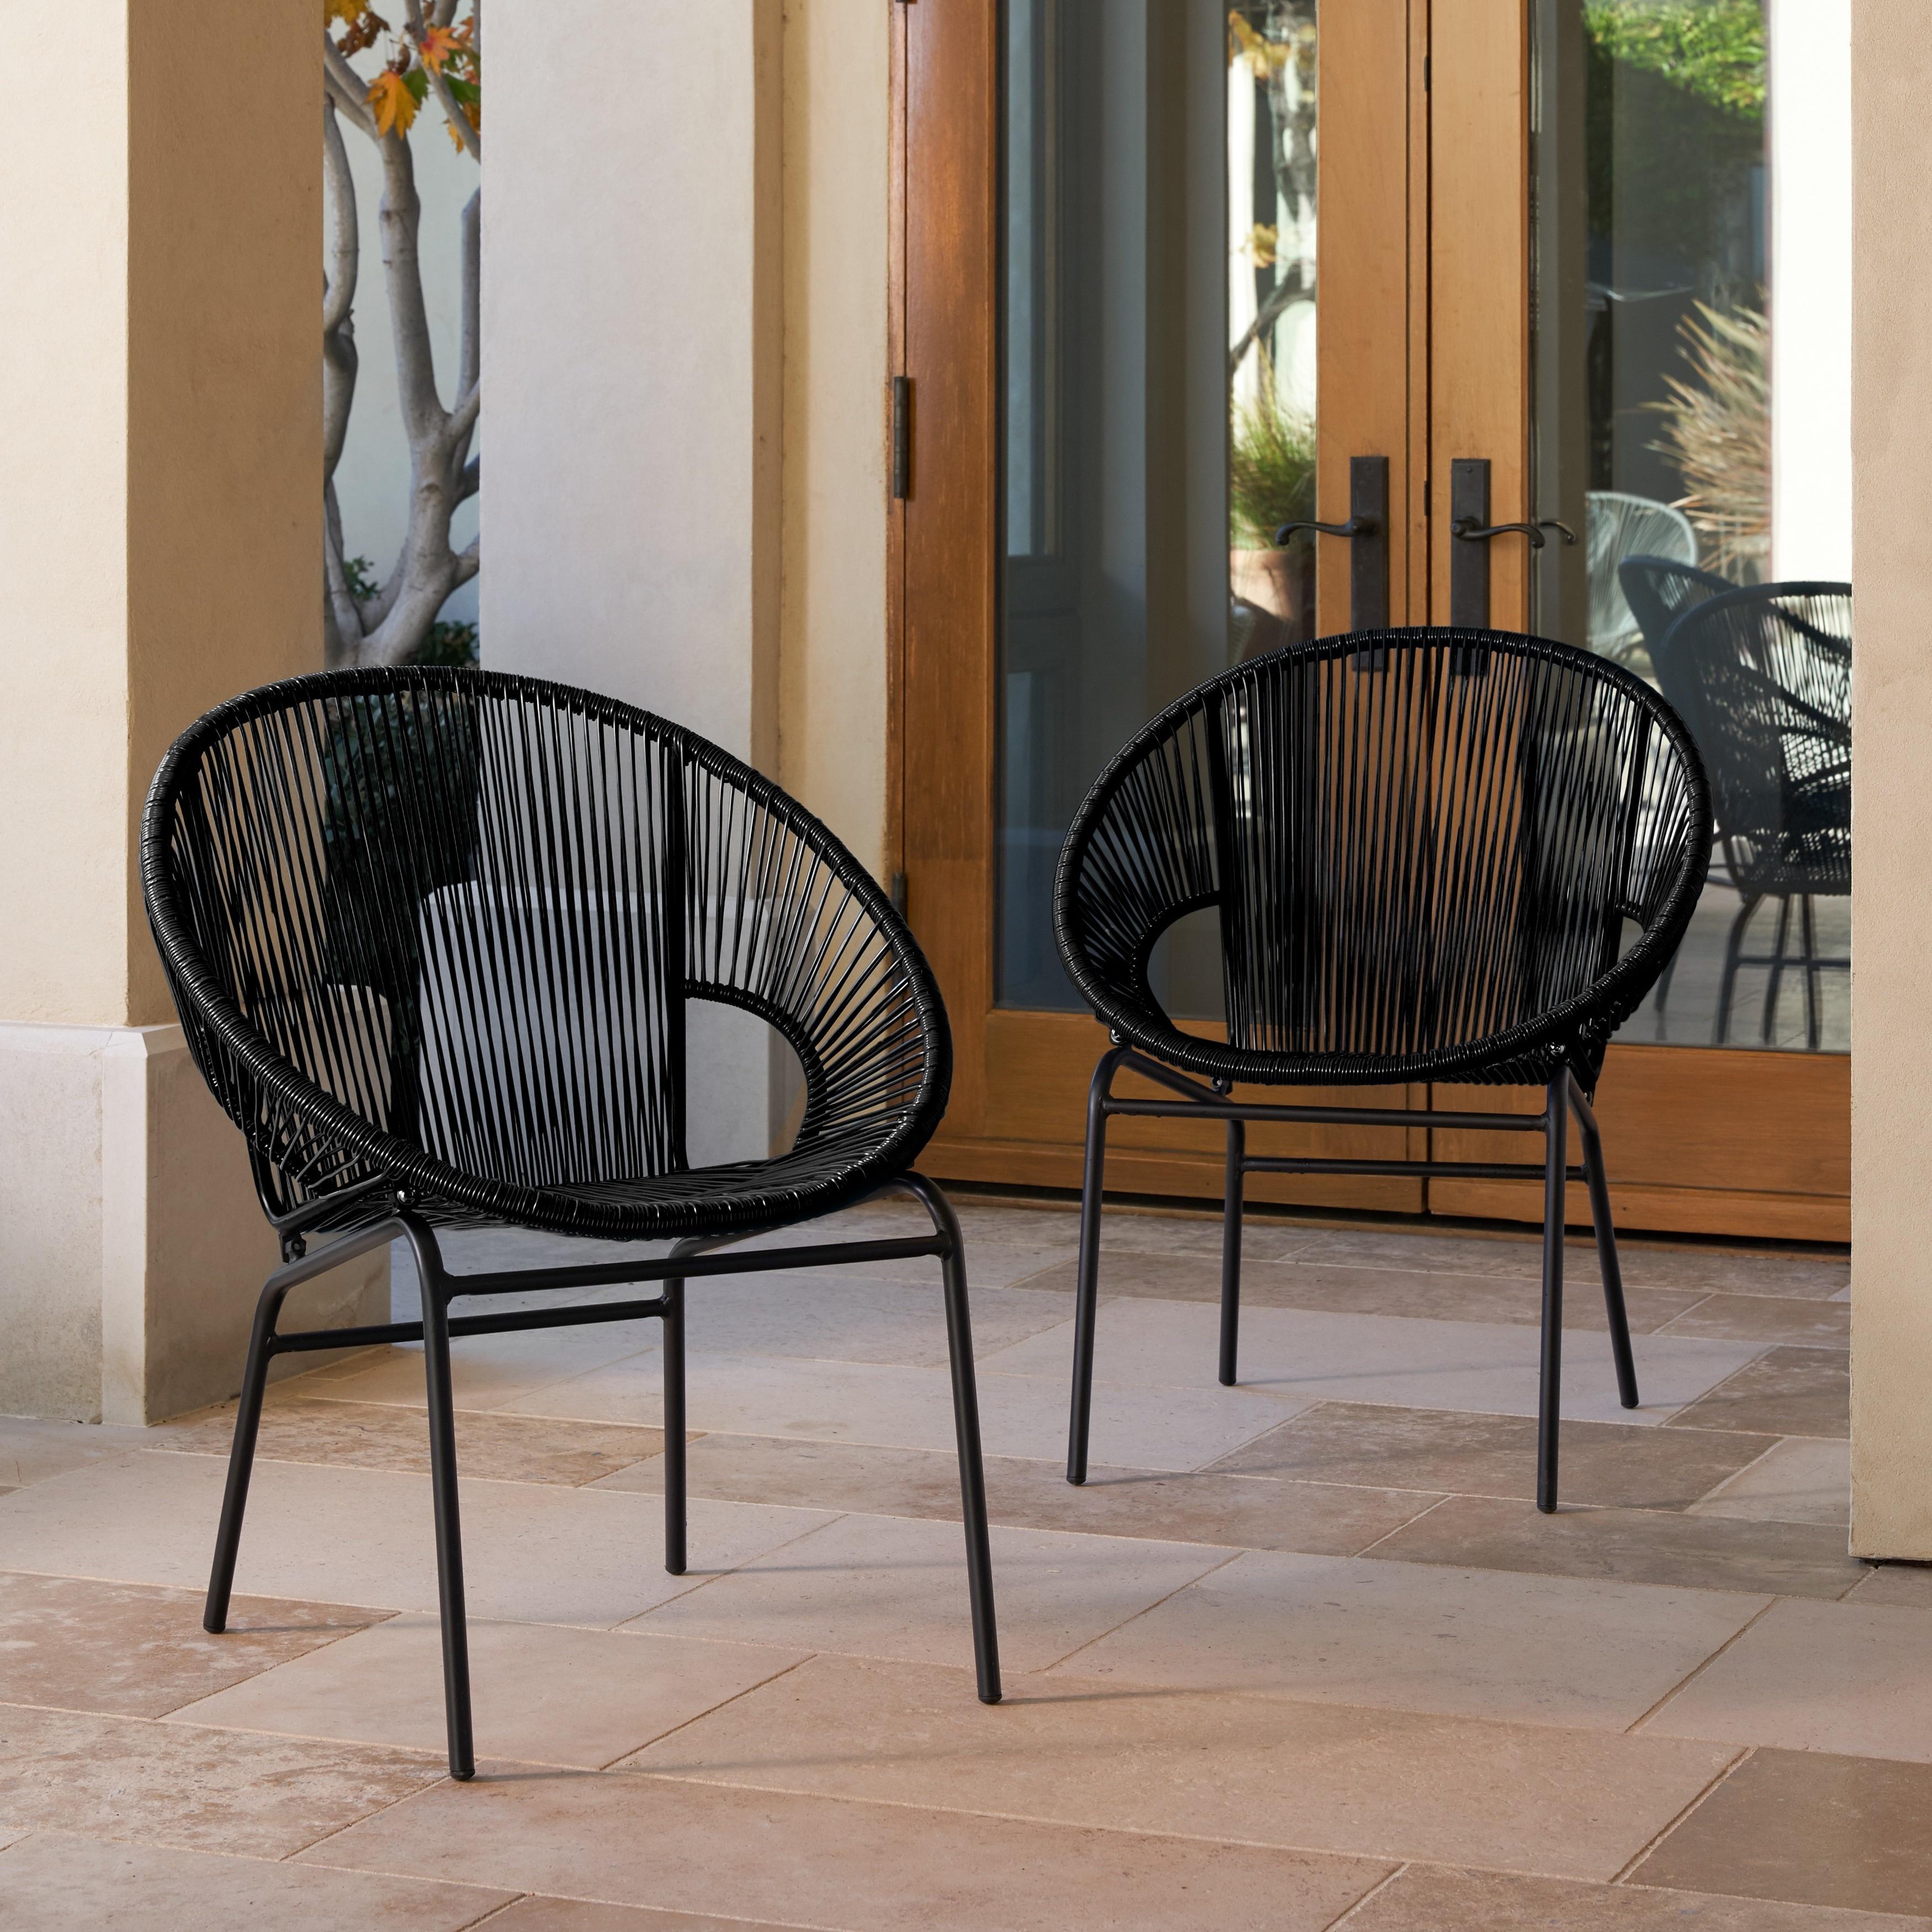 Shop Corvus Sarcelles Woven Wicker Patio Chairs Set Of 2 On Sale